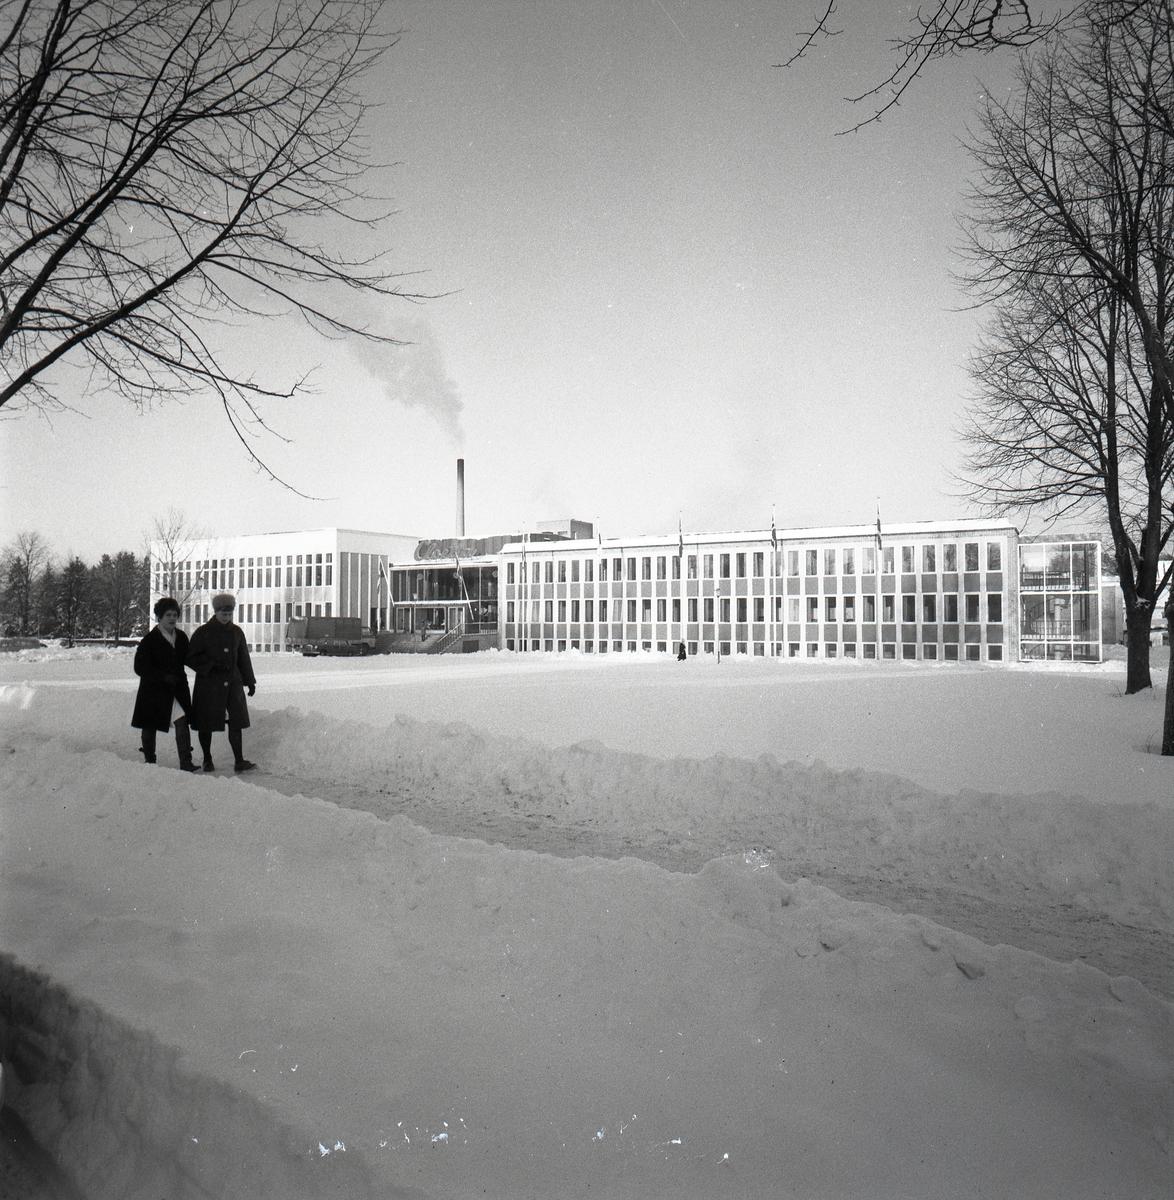 Orig. text: Cloetta Vinter-exteriör. 1965-12Cloetta. Svenska Chokladfabriks Aktiebolaget, Ljungsbro.